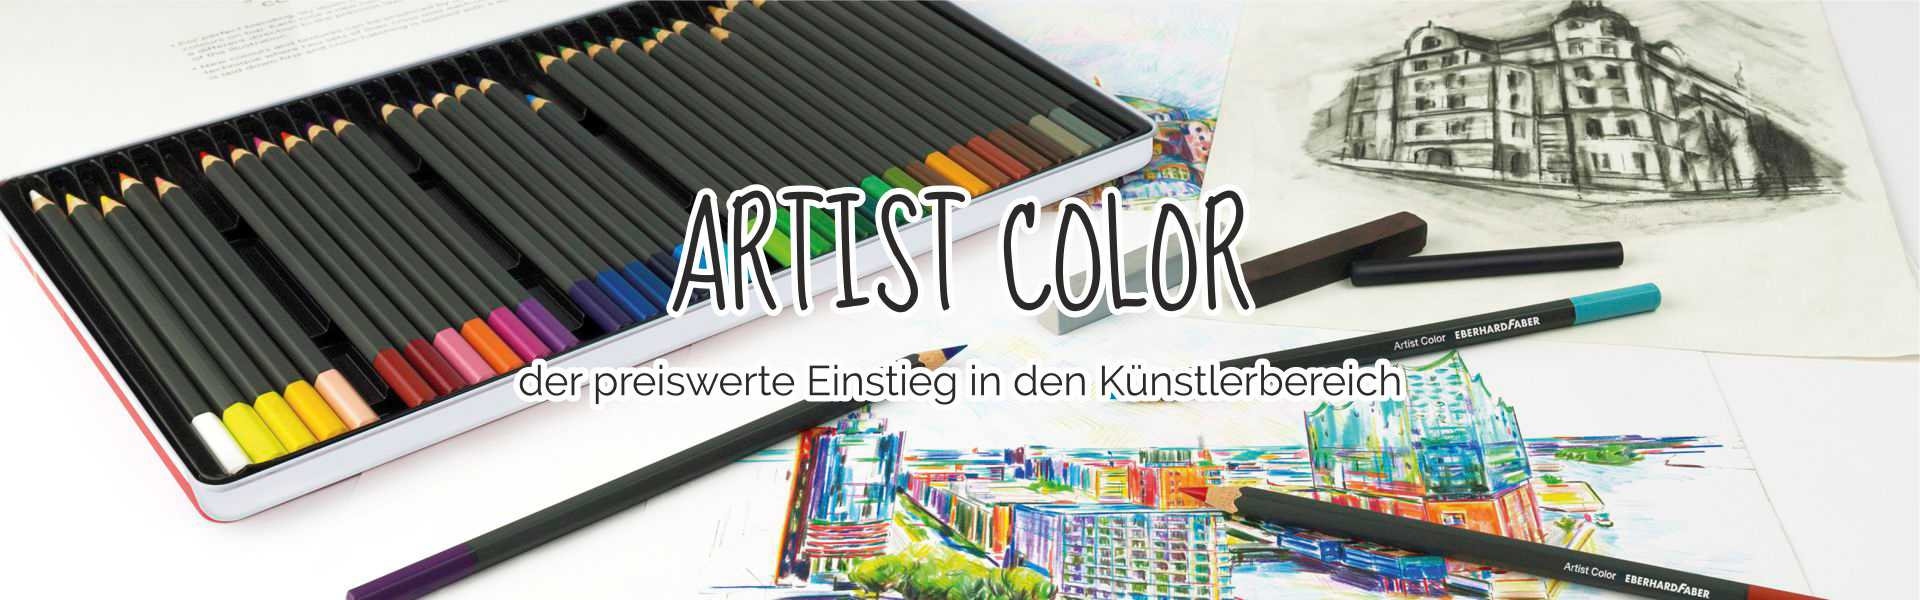 Artist Color